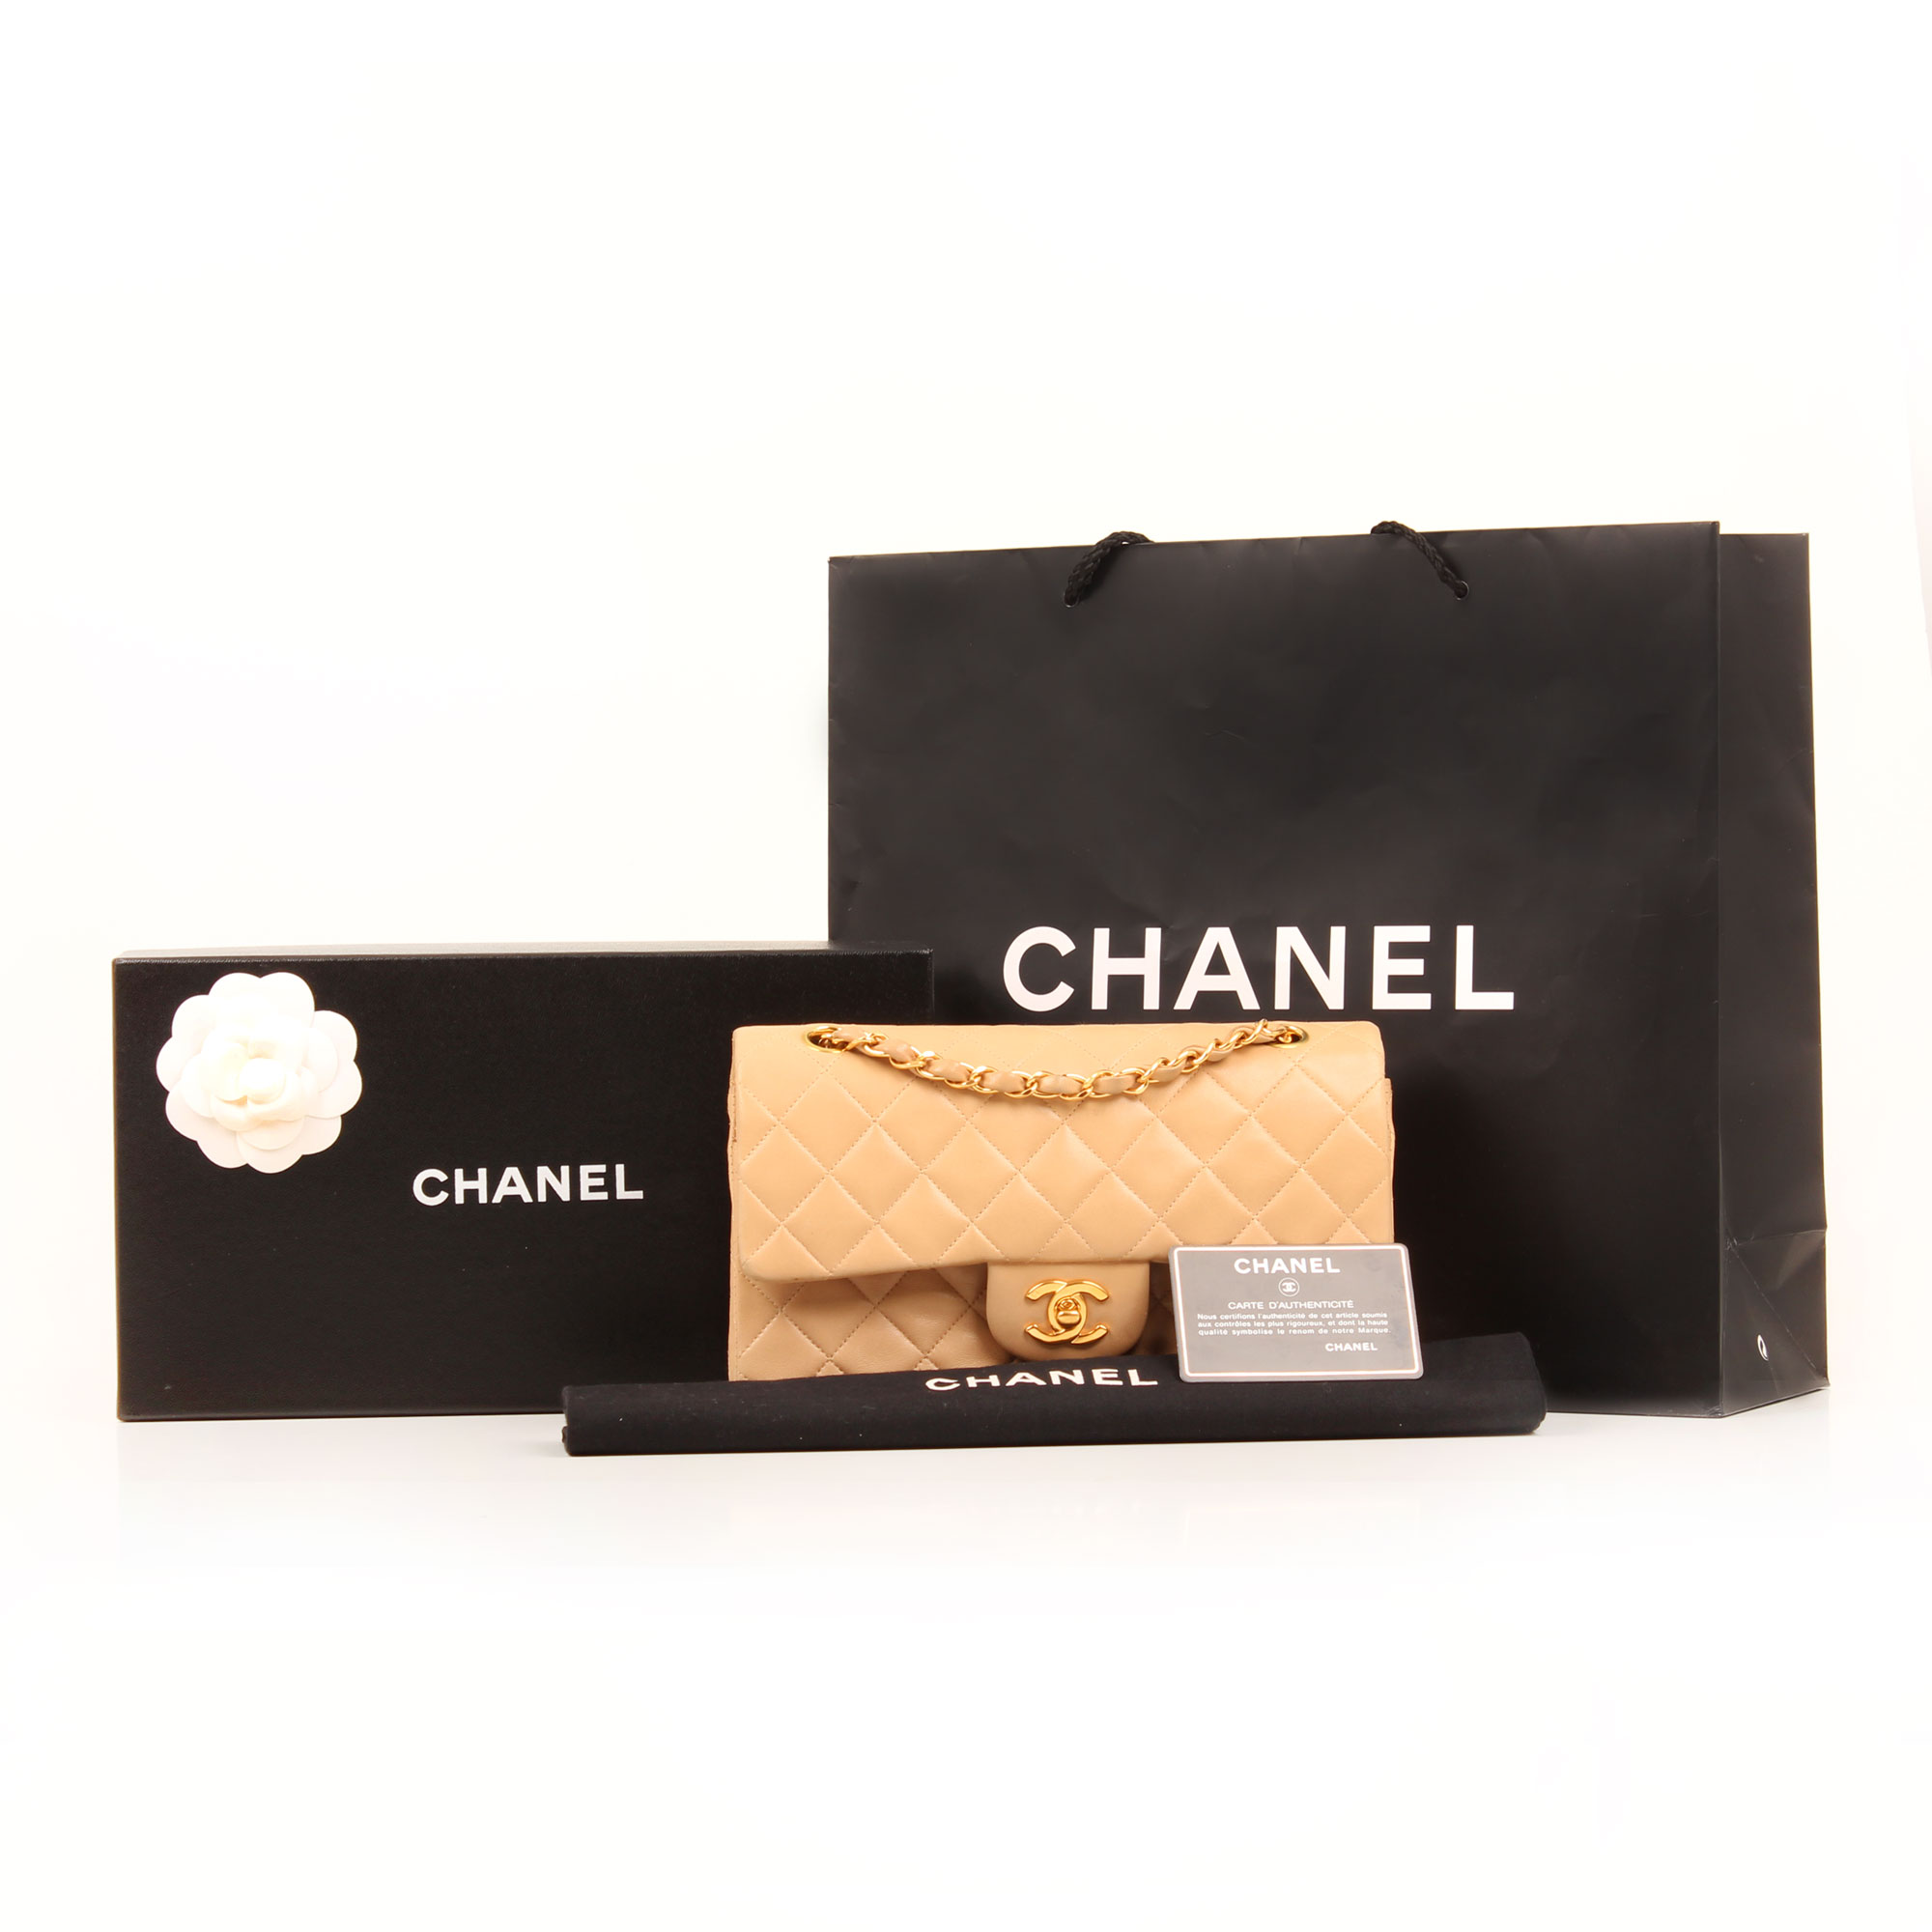 Imagen de los extras del bolso chanel classic double flap beige